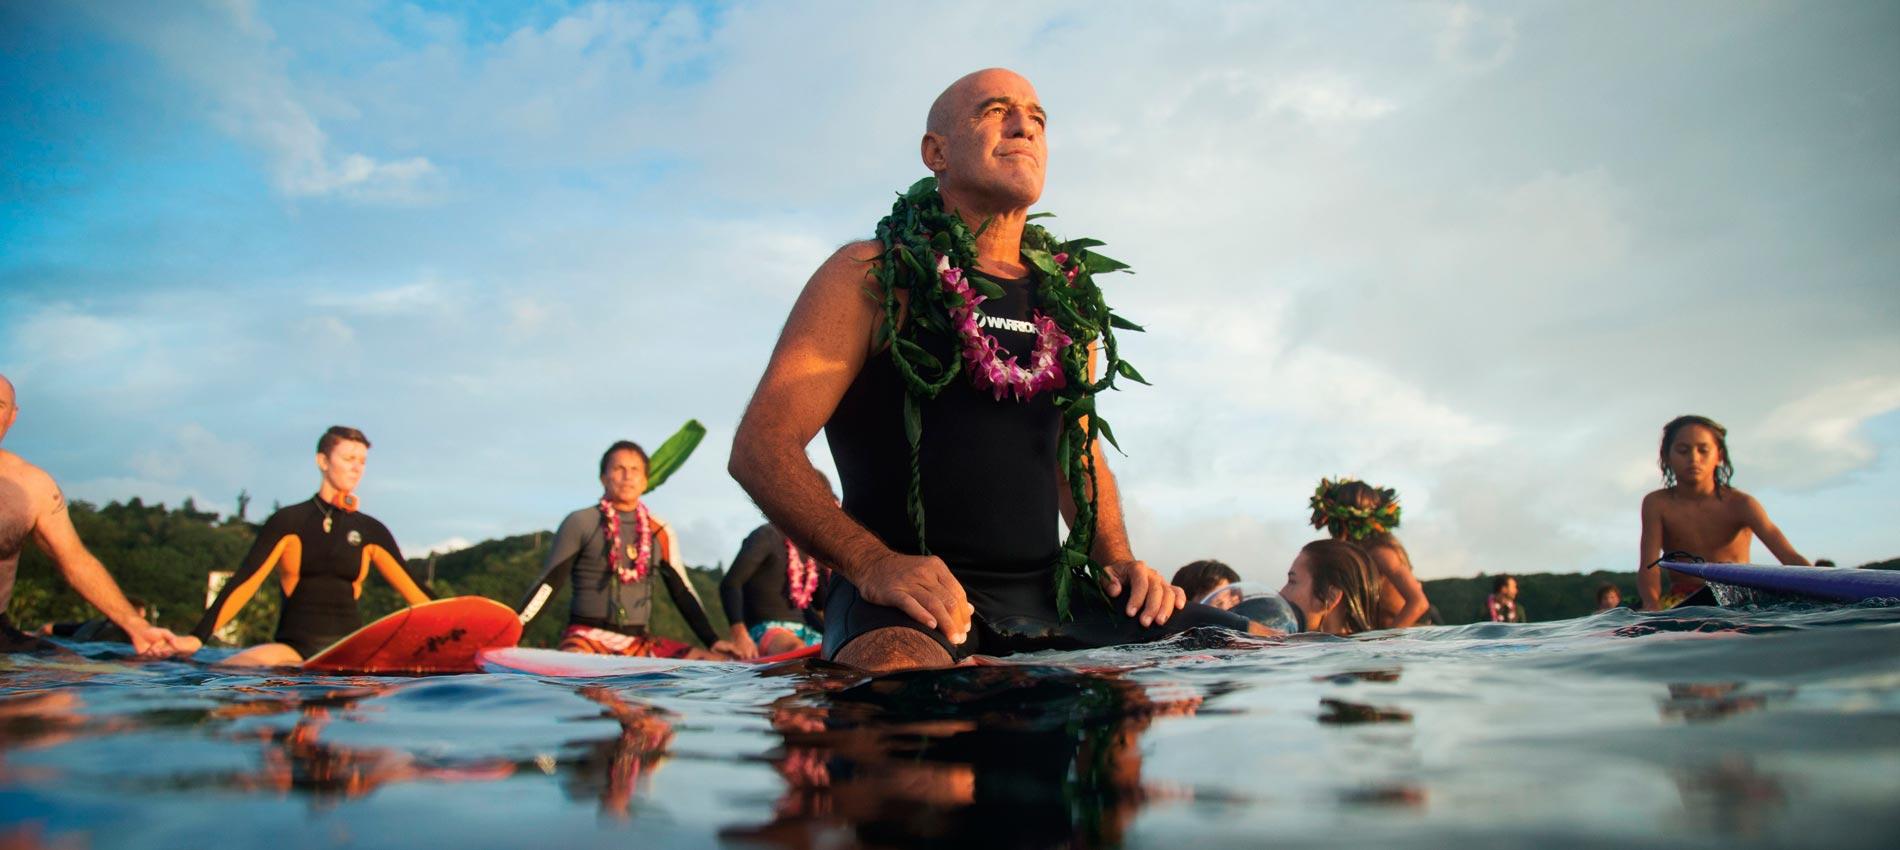 Hawaii Travel Synonyms